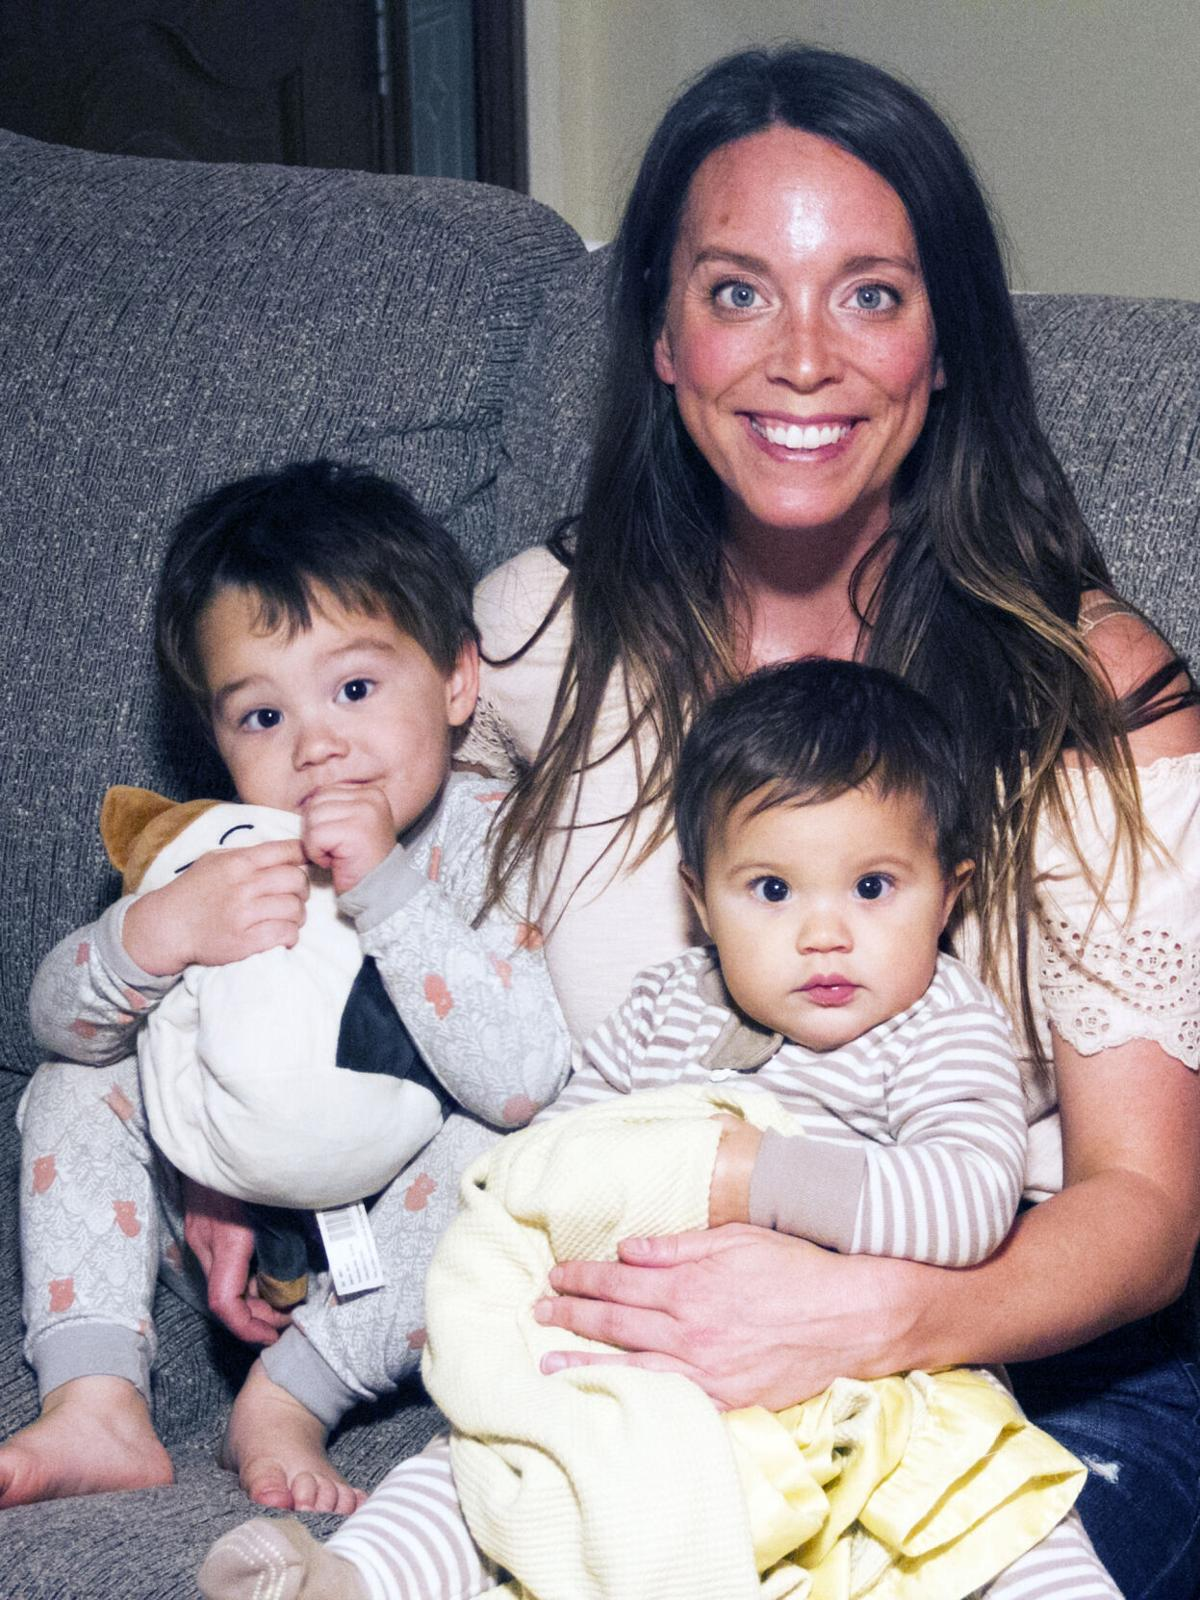 Katy with children